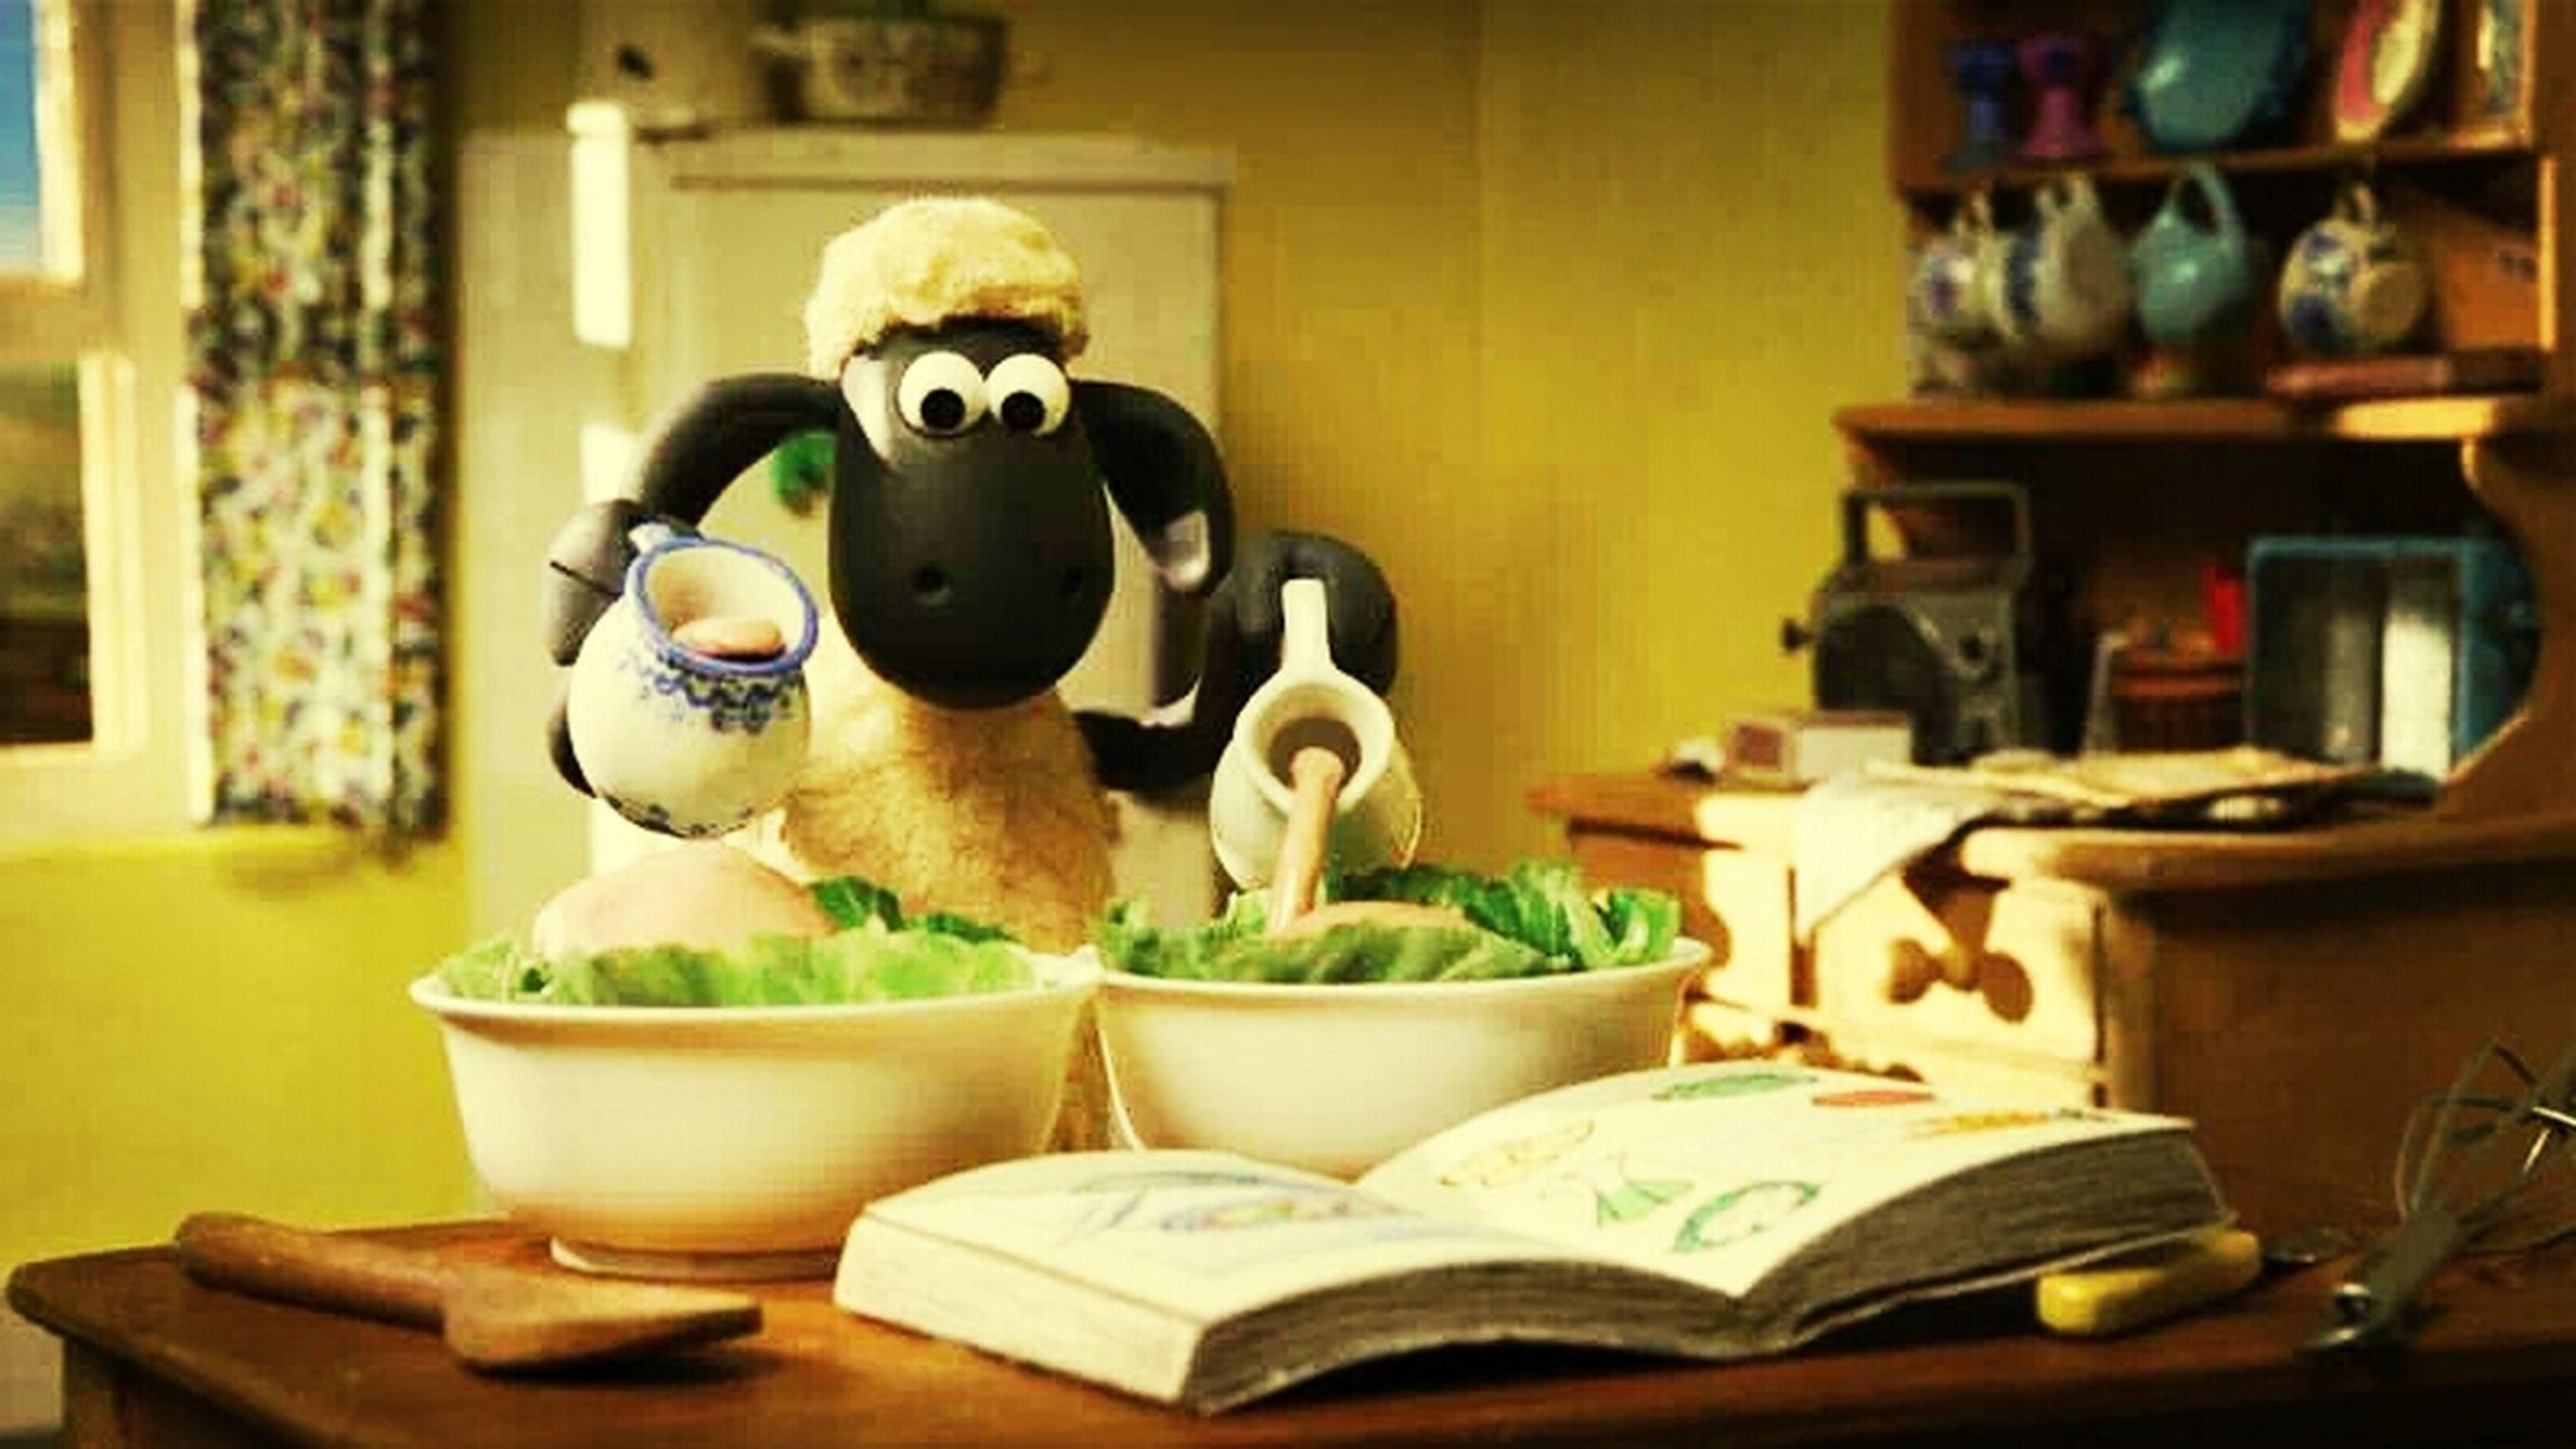 indoors, still life, table, home interior, human representation, art and craft, art, close-up, shelf, creativity, figurine, animal representation, toy, focus on foreground, no people, vase, variation, decoration, arrangement